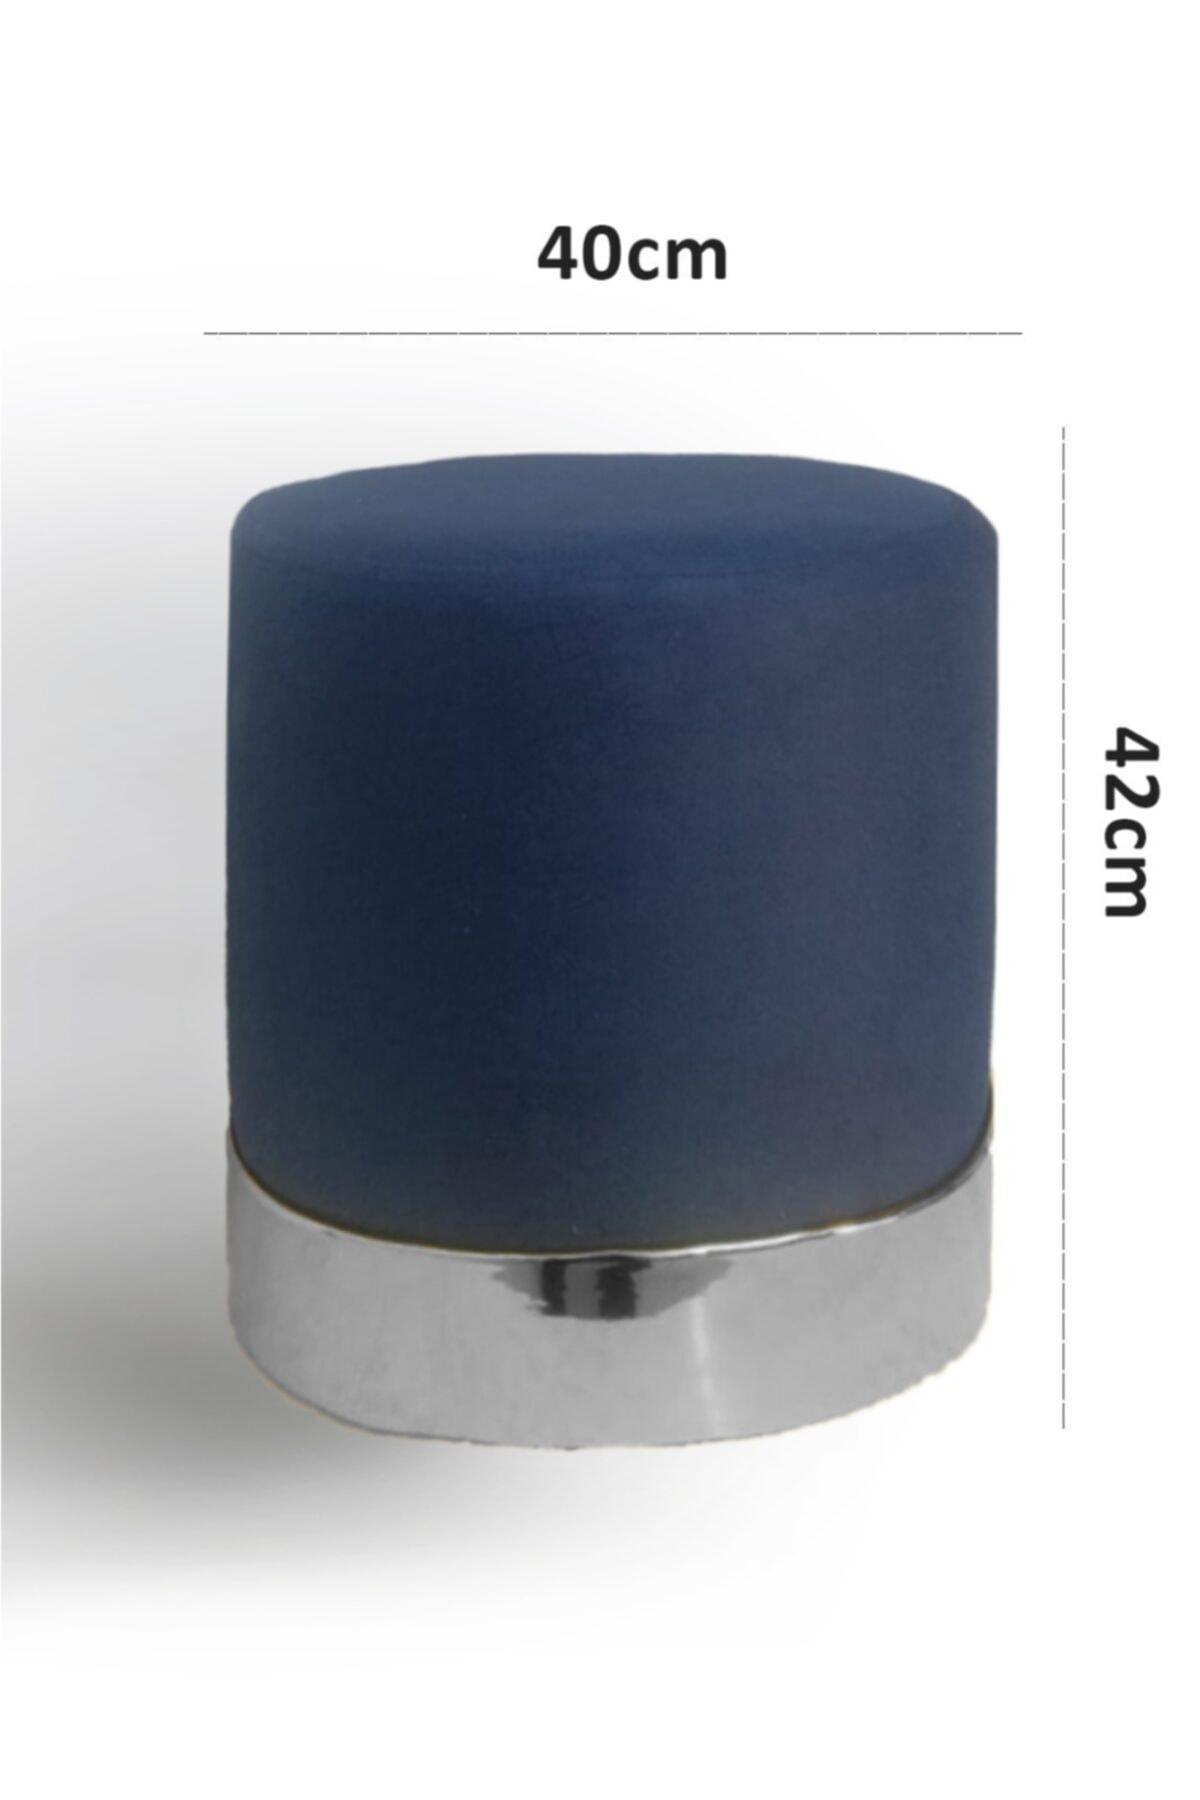 Zem Queen Blue - Silver Puf 2